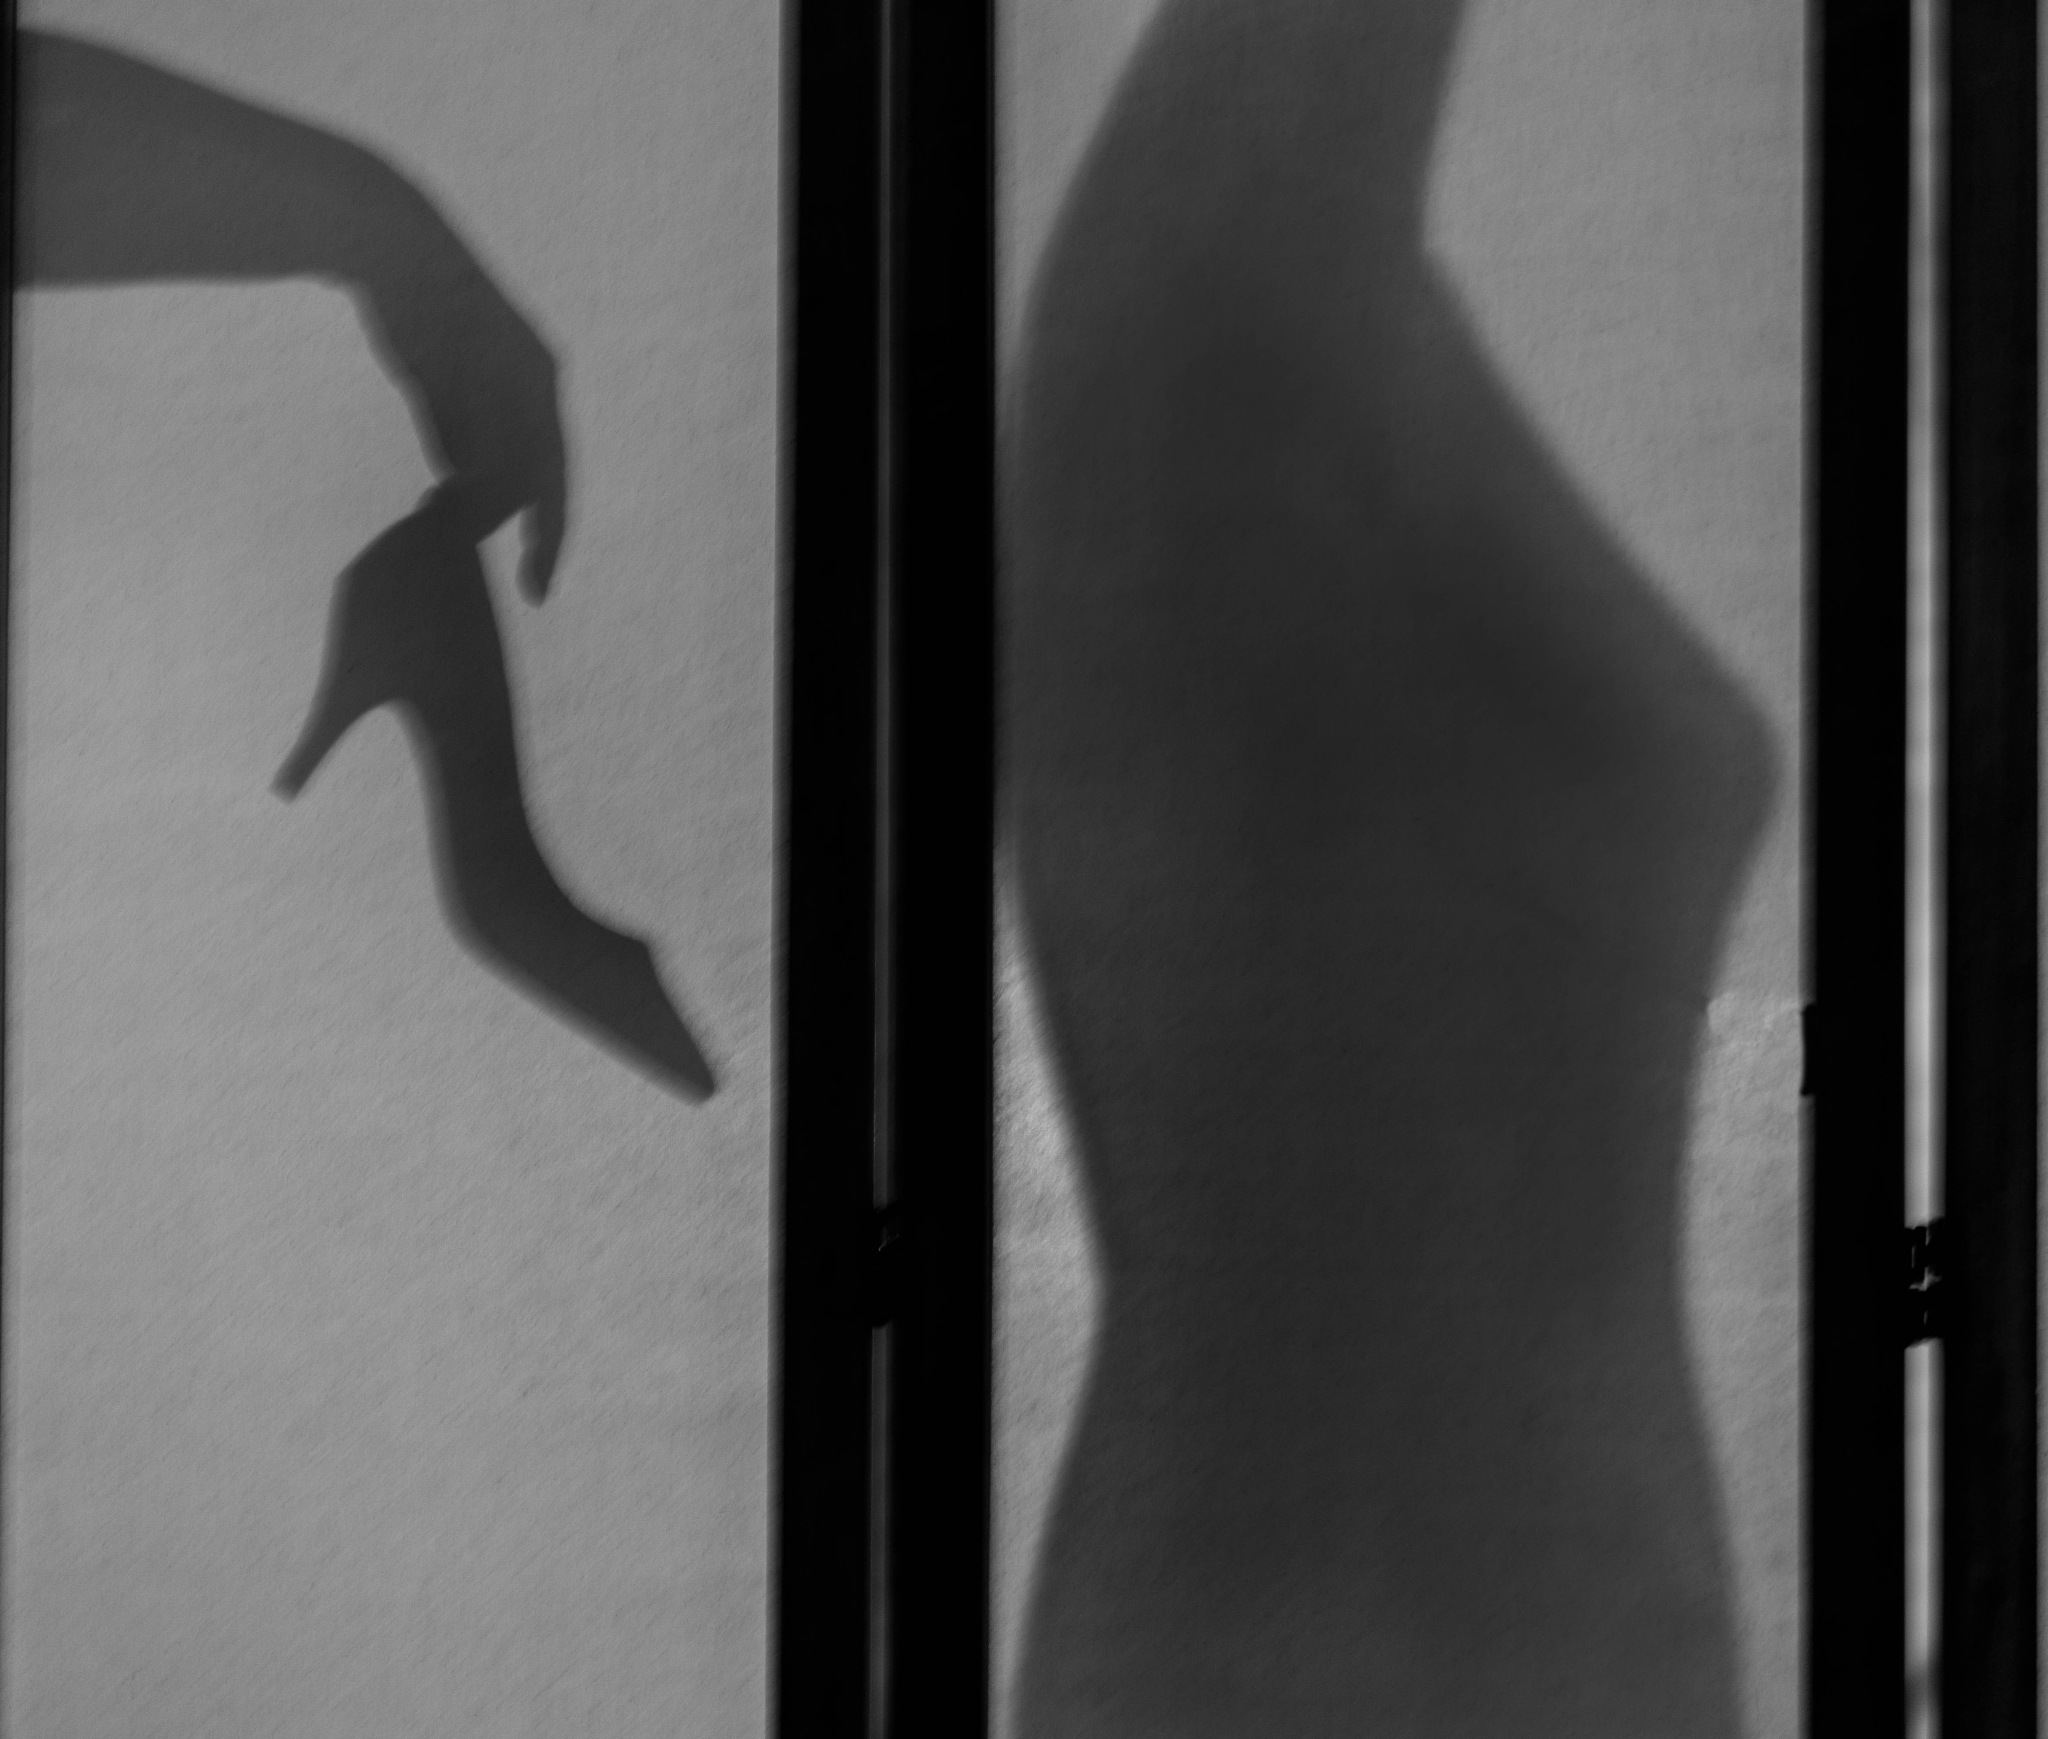 shadow by Tünde Balko